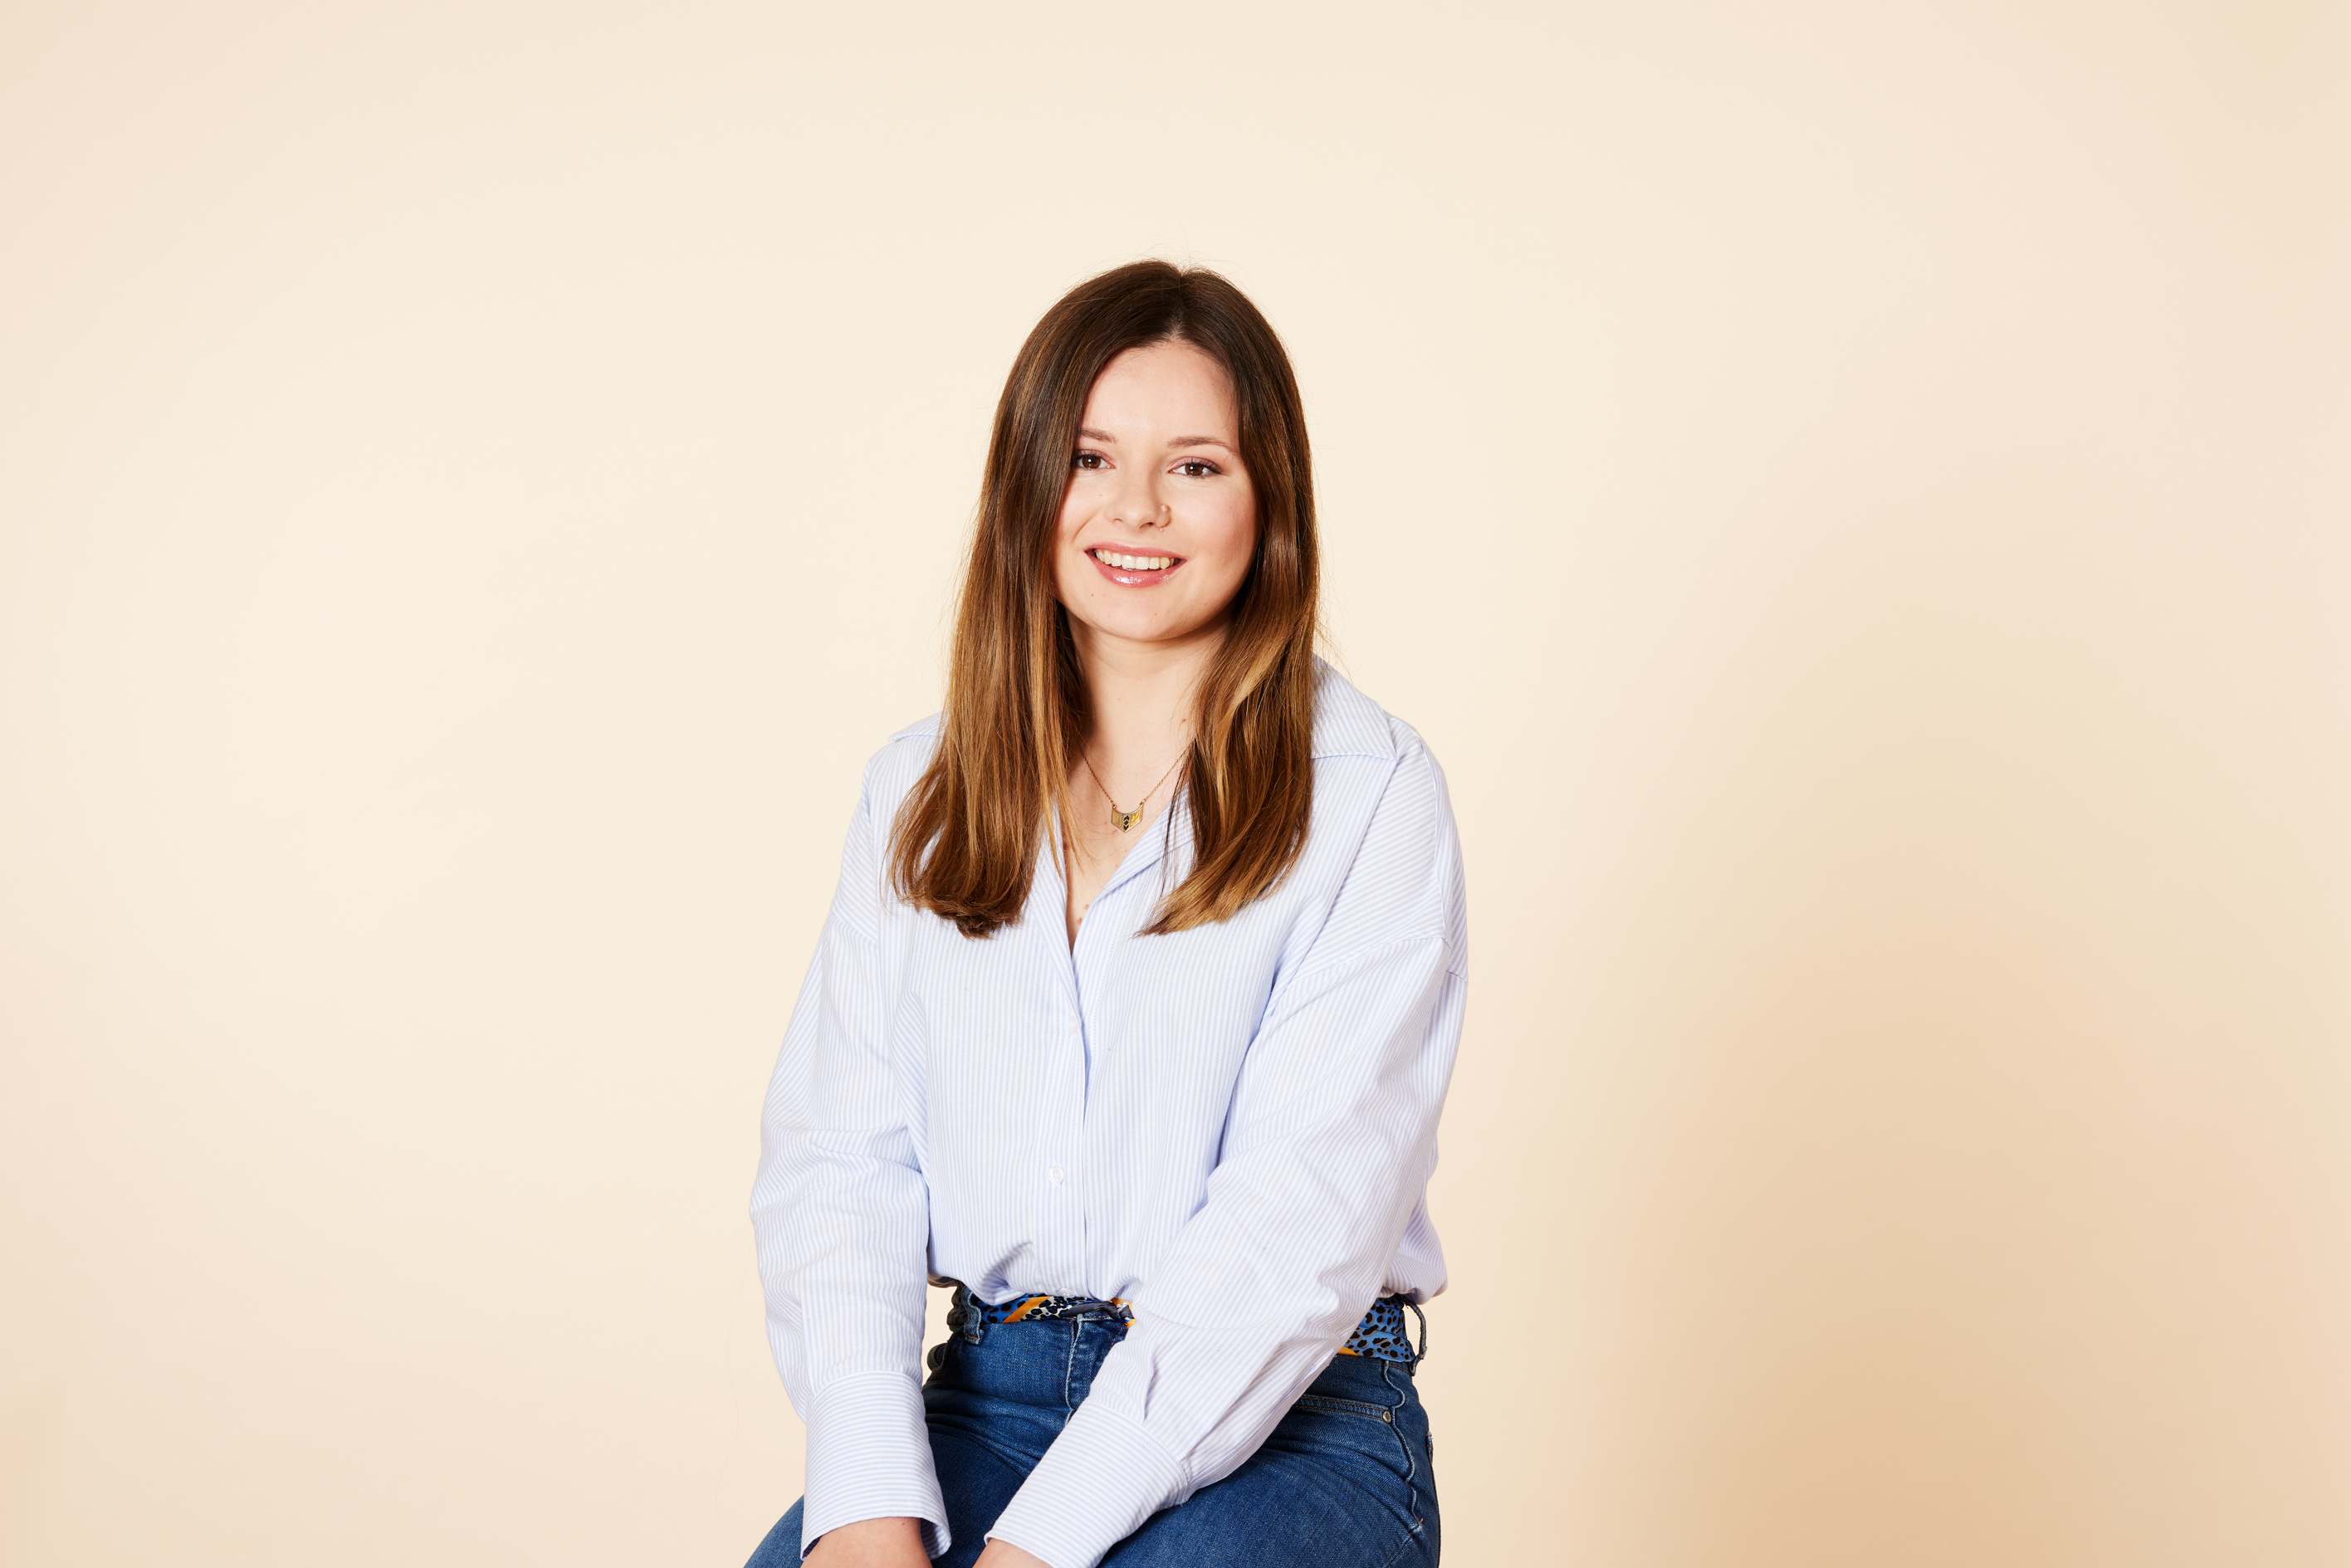 Mihaela Andries